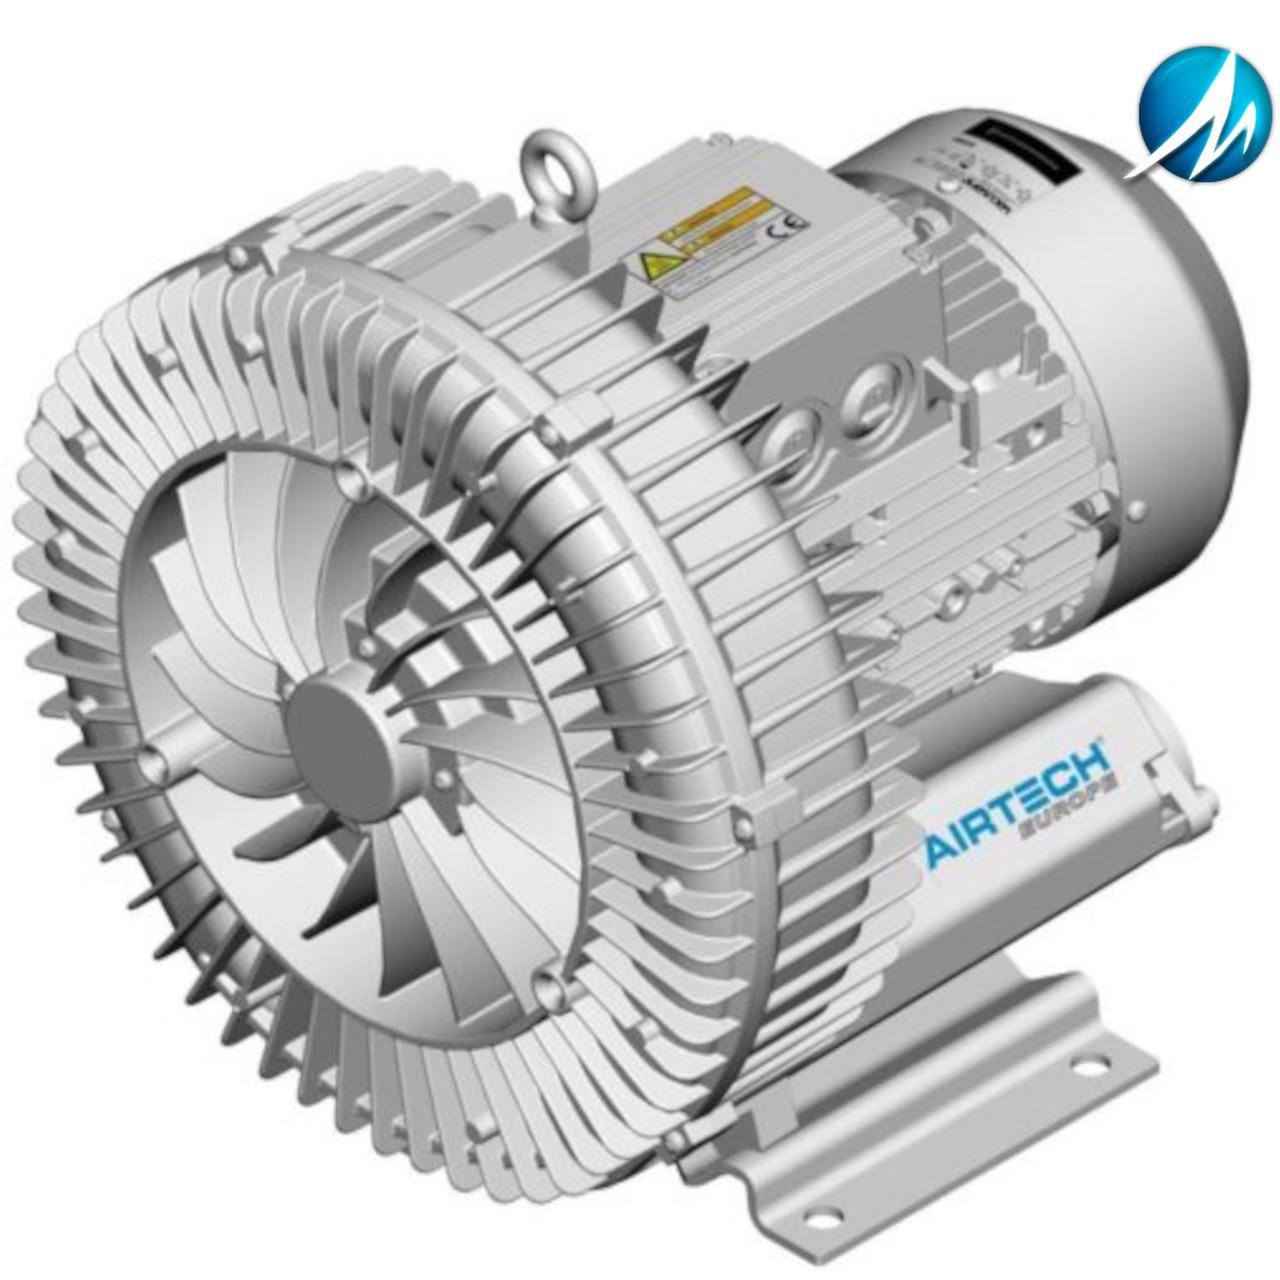 Компрессор HPE AIRTECH 1,1 кВт (210 м³/ч, 160 мБар, 220 В)